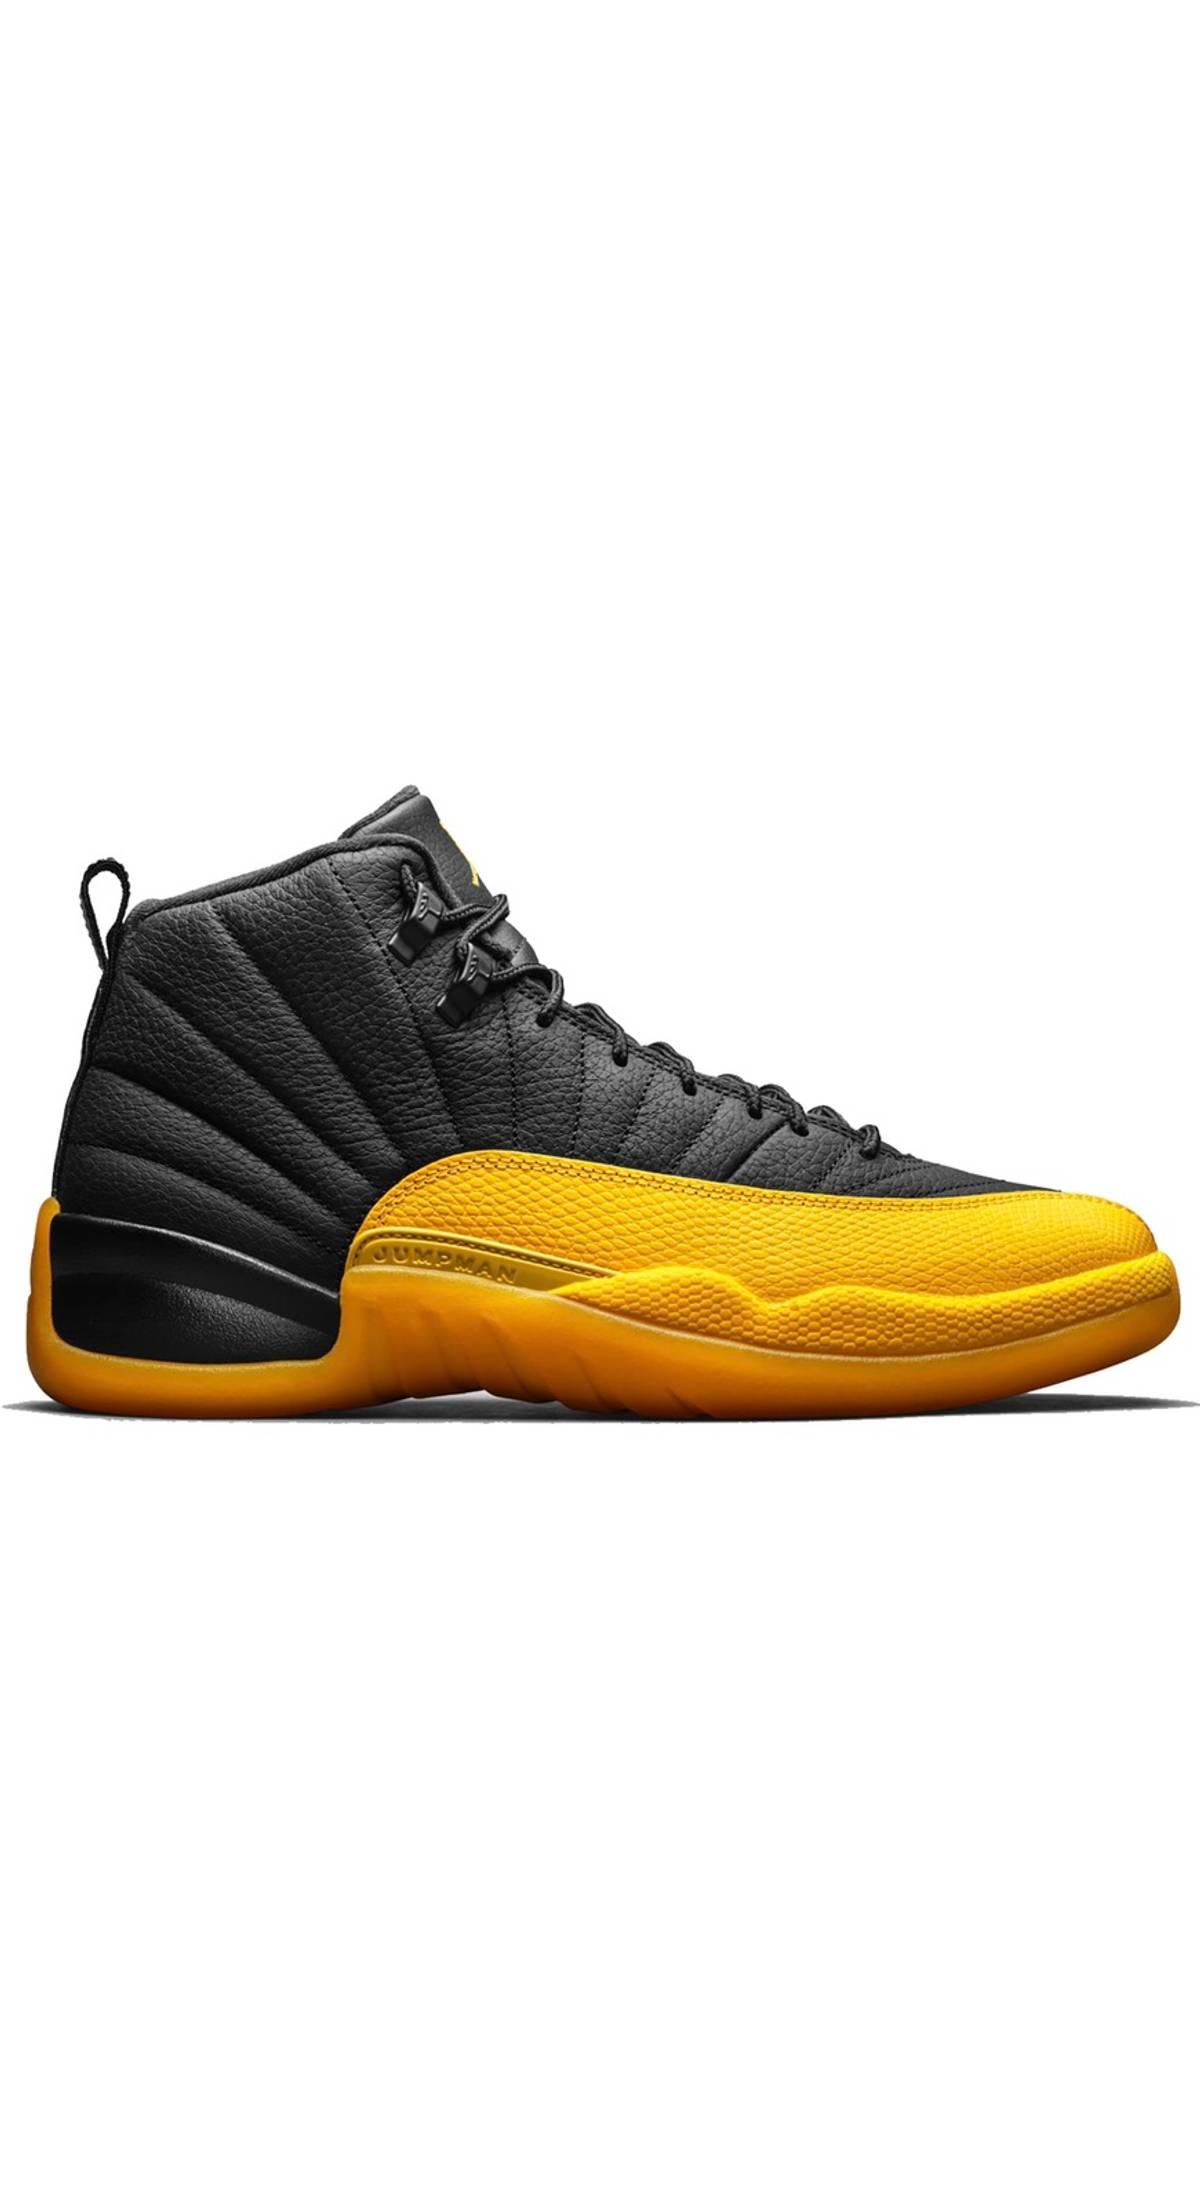 Nike Air Jordan 12 University Gold Size 11 Grailed